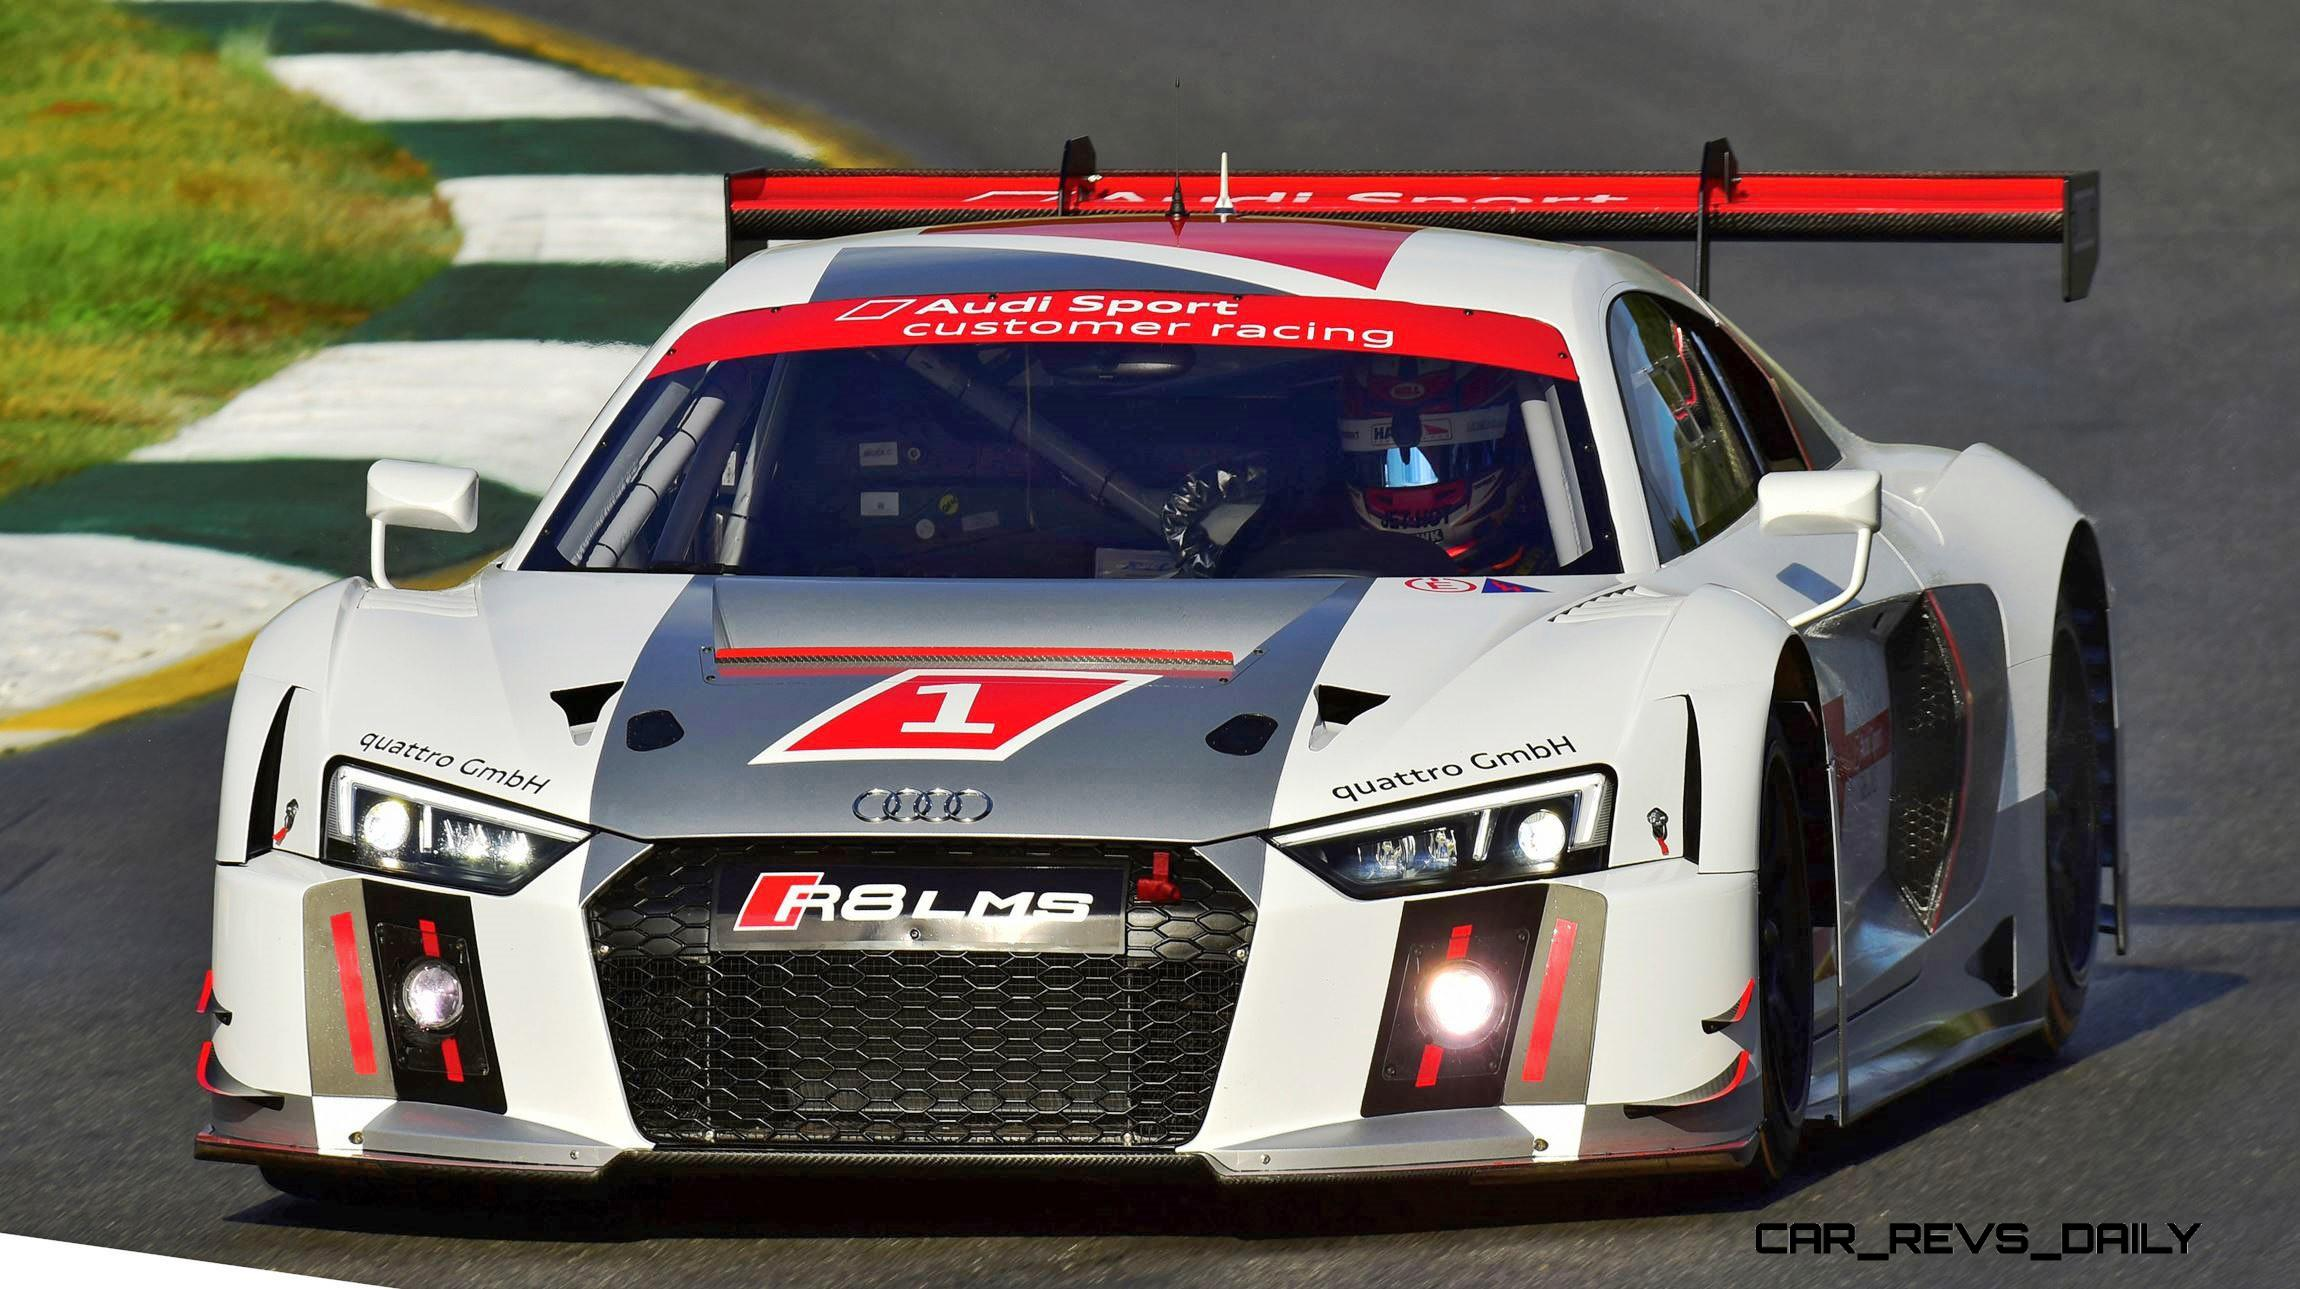 2016 Audi R8 Lms New Open Aero Design Analysis Specs And Pricing